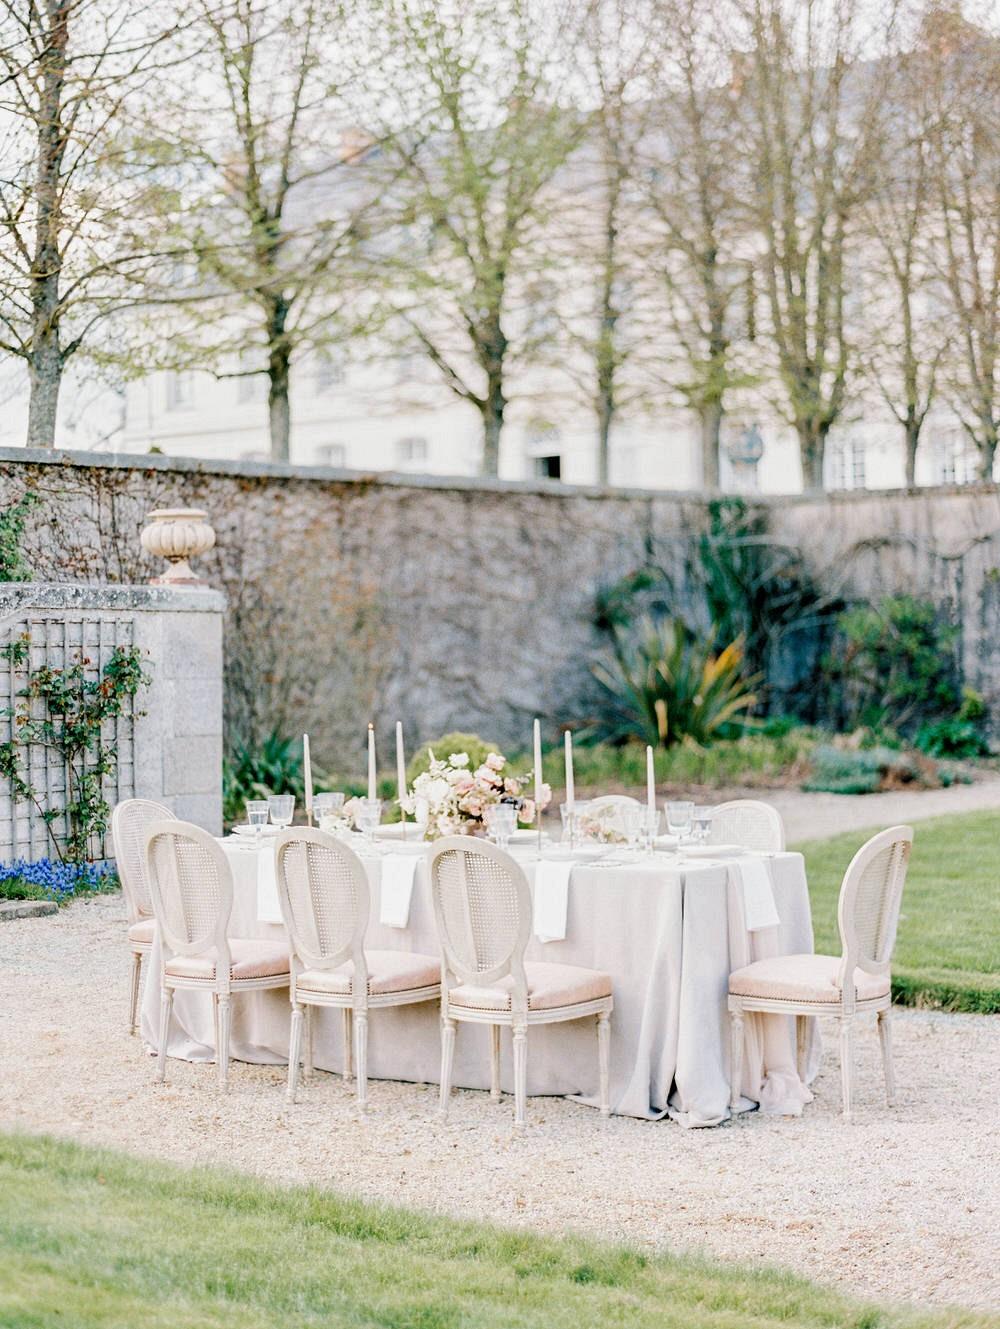 Fairytale destination wedding in France